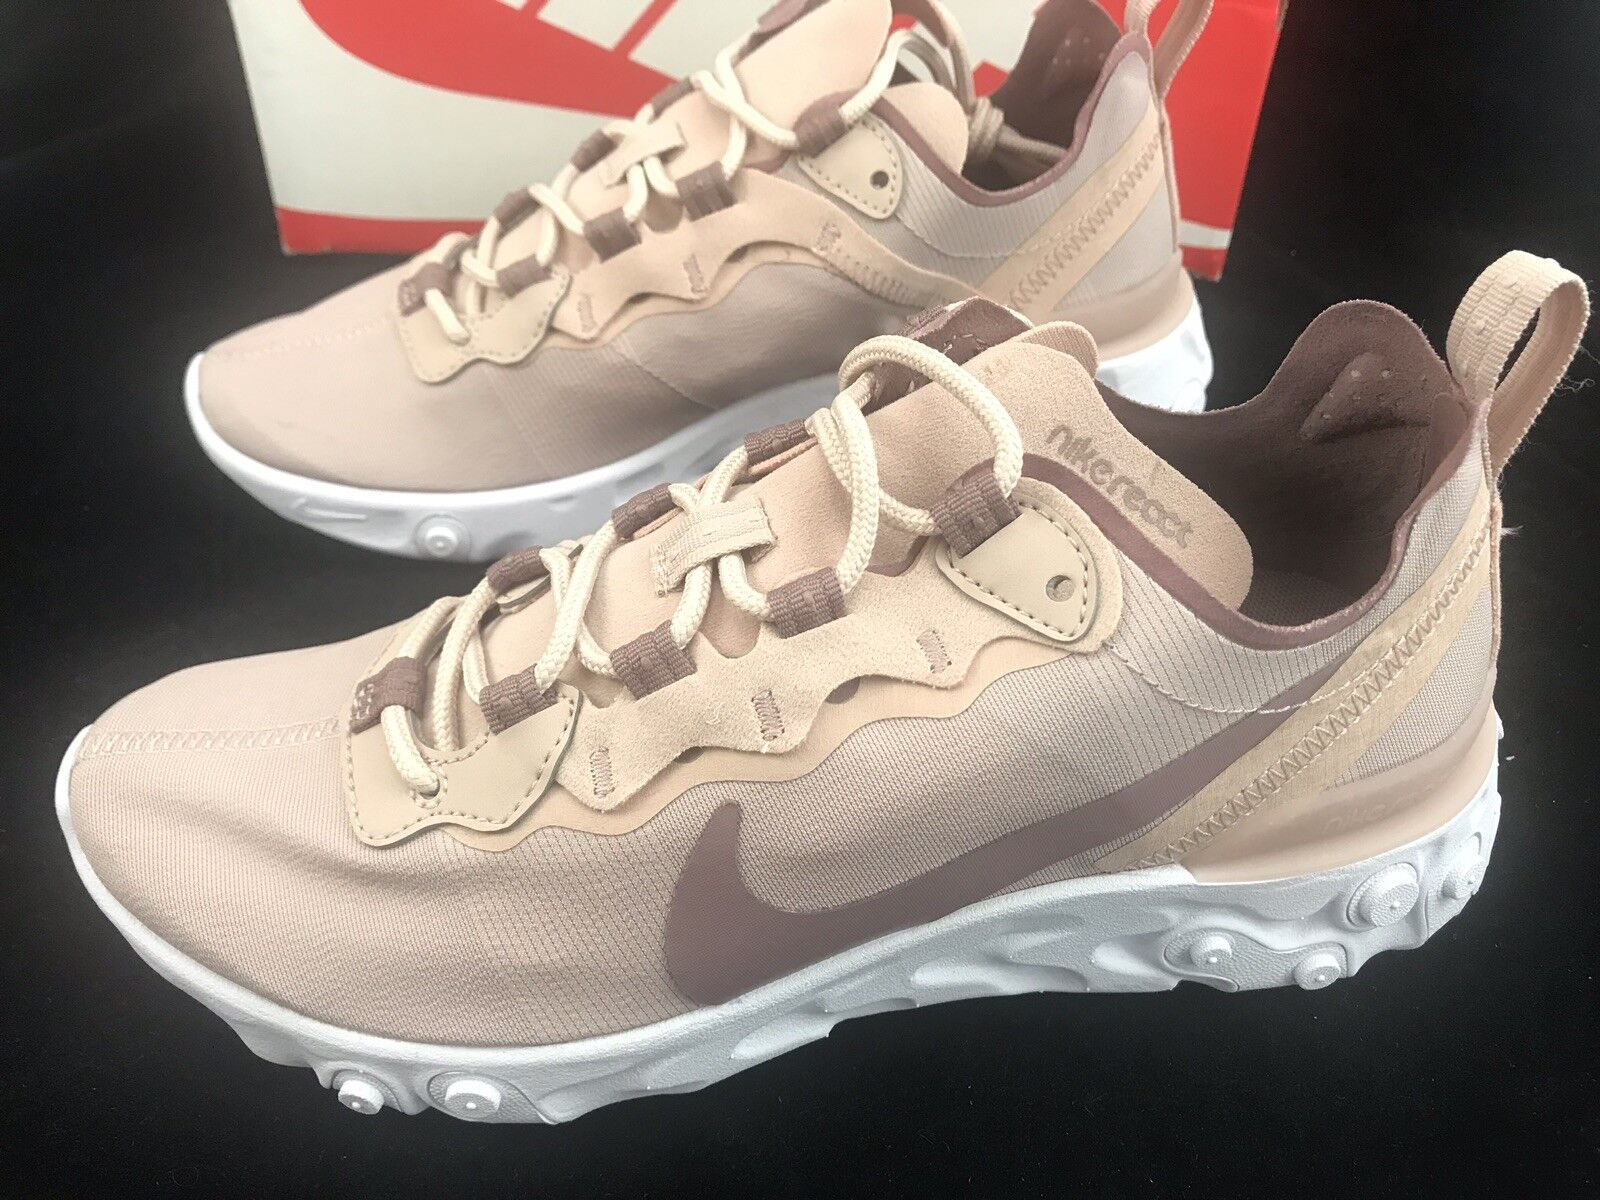 b084b4c4a5dd3 Women's Nike React 55 Particle Beige BQ2728 200 Running Size 6 shoes ...